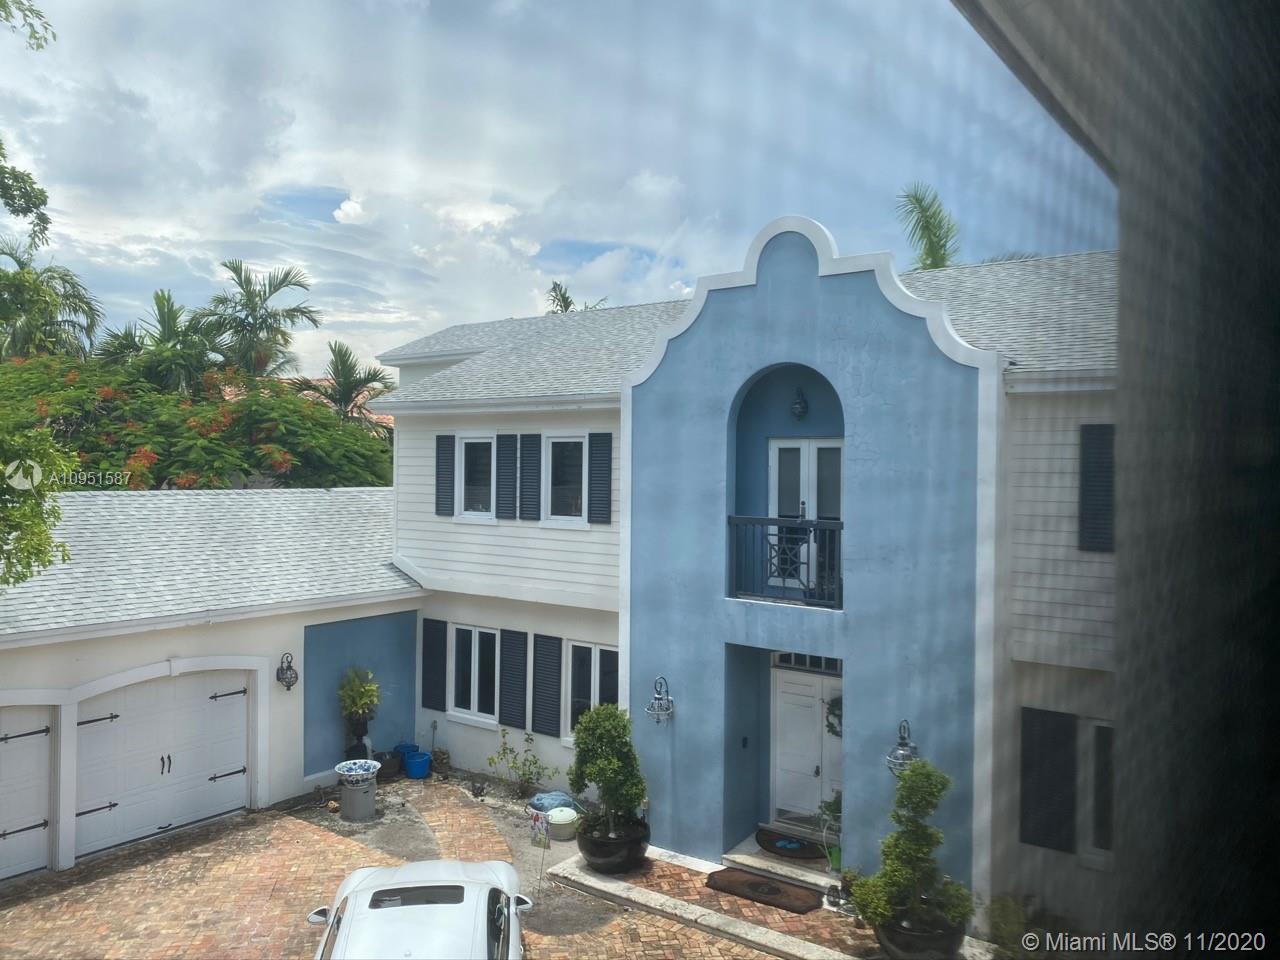 Photo of 9  Harborage, Fort Lauderdale, FL 33316